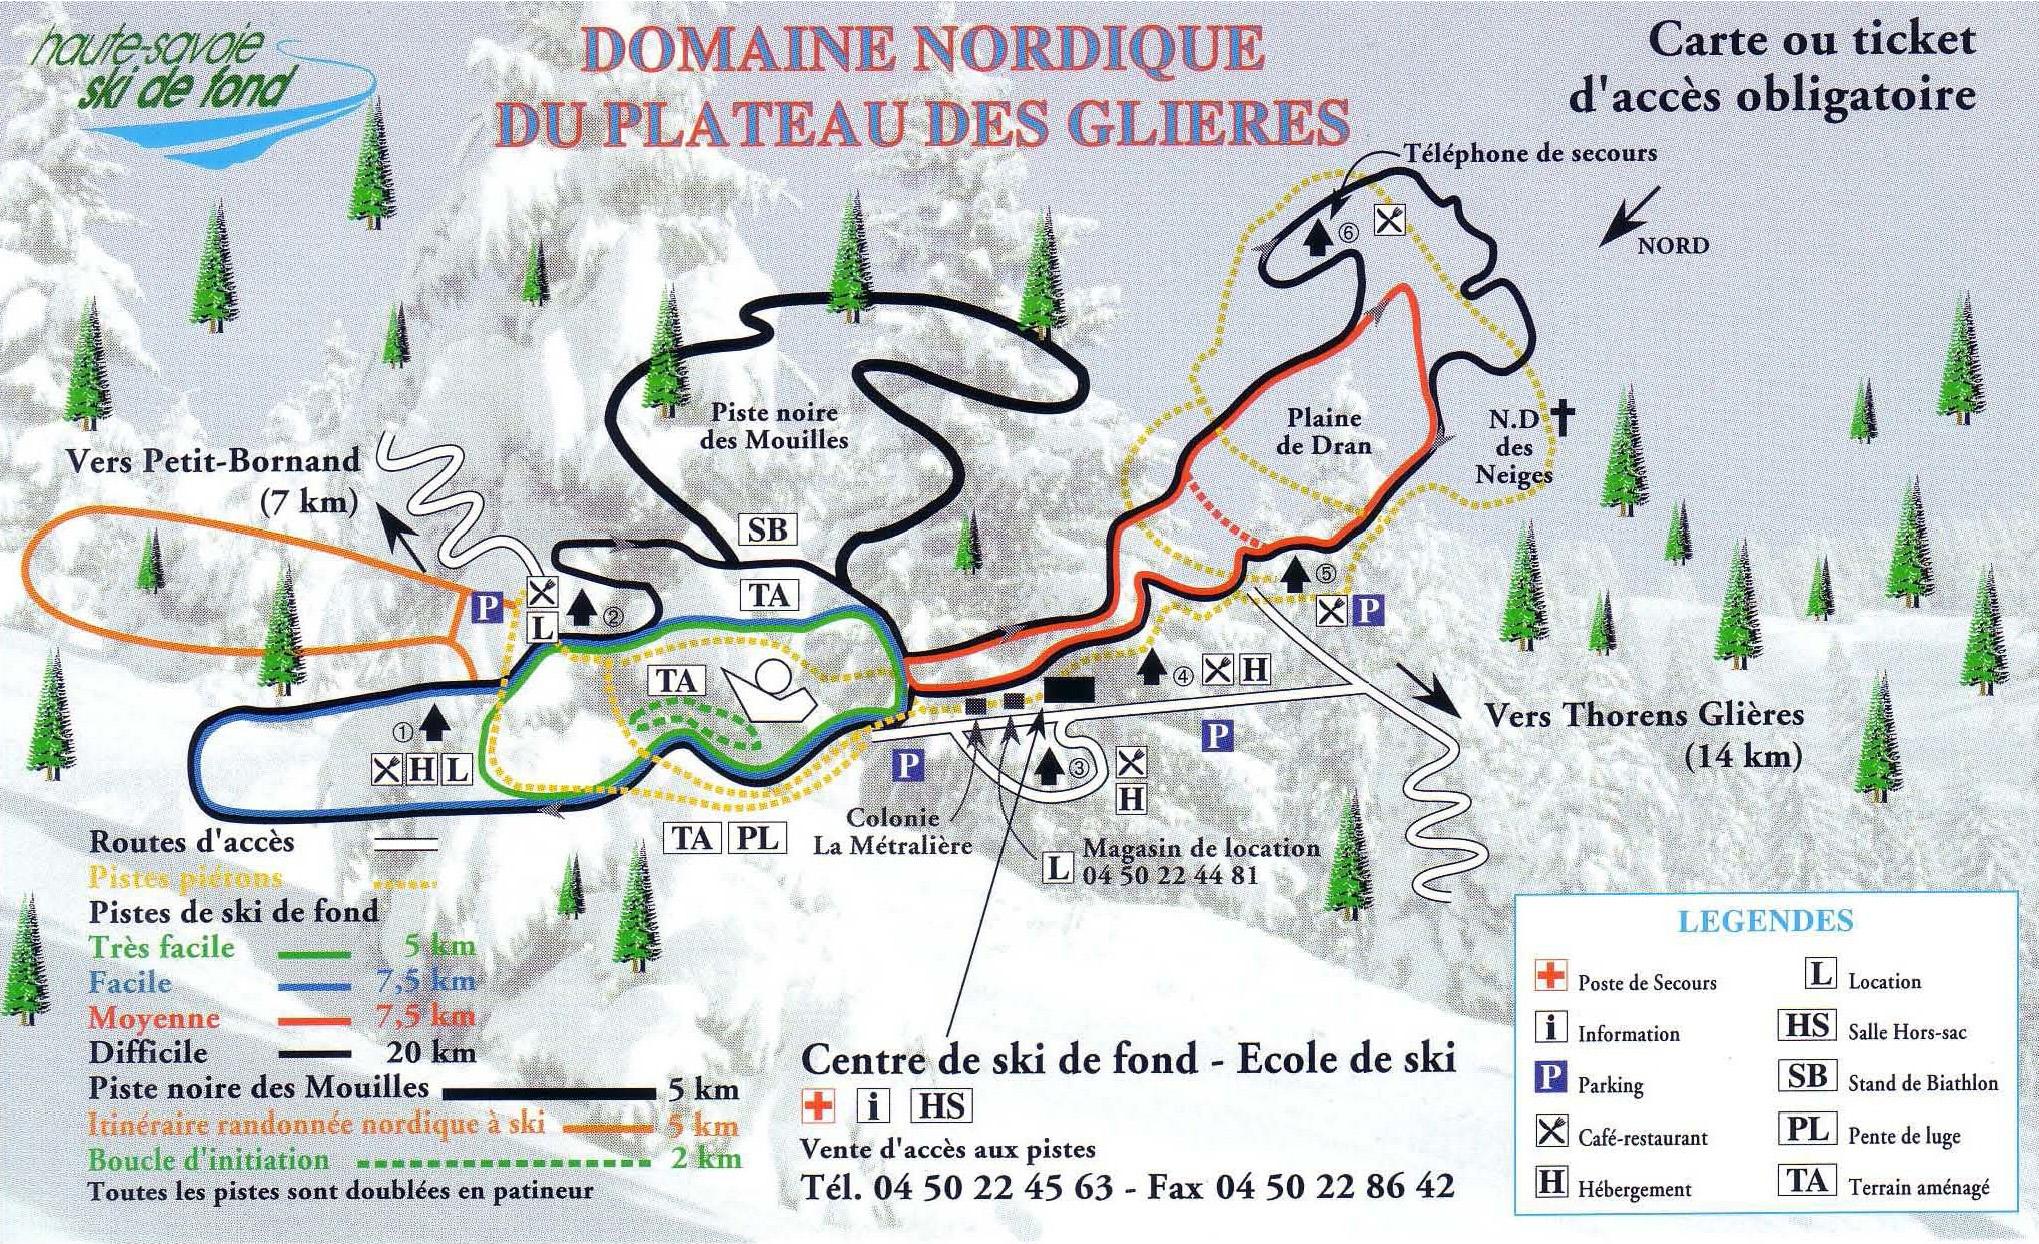 Station De Ski Thorens Gli 232 Res Pays De Filli 232 Re Alpes Du